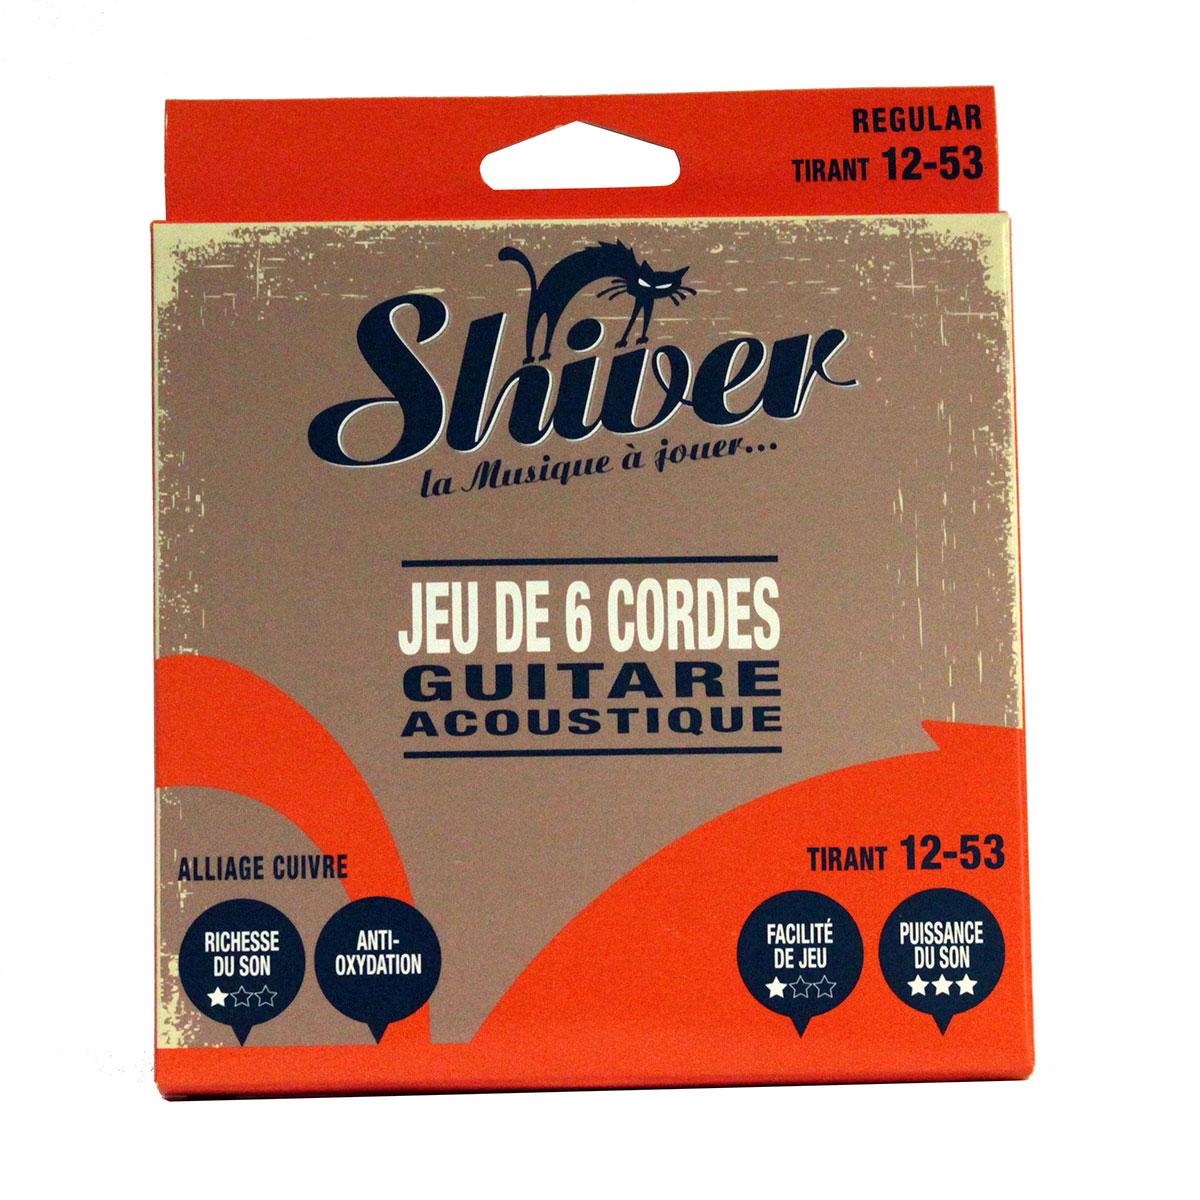 Shiver - Jeu 6 cordes guitare folk 12-53 basic cuivre